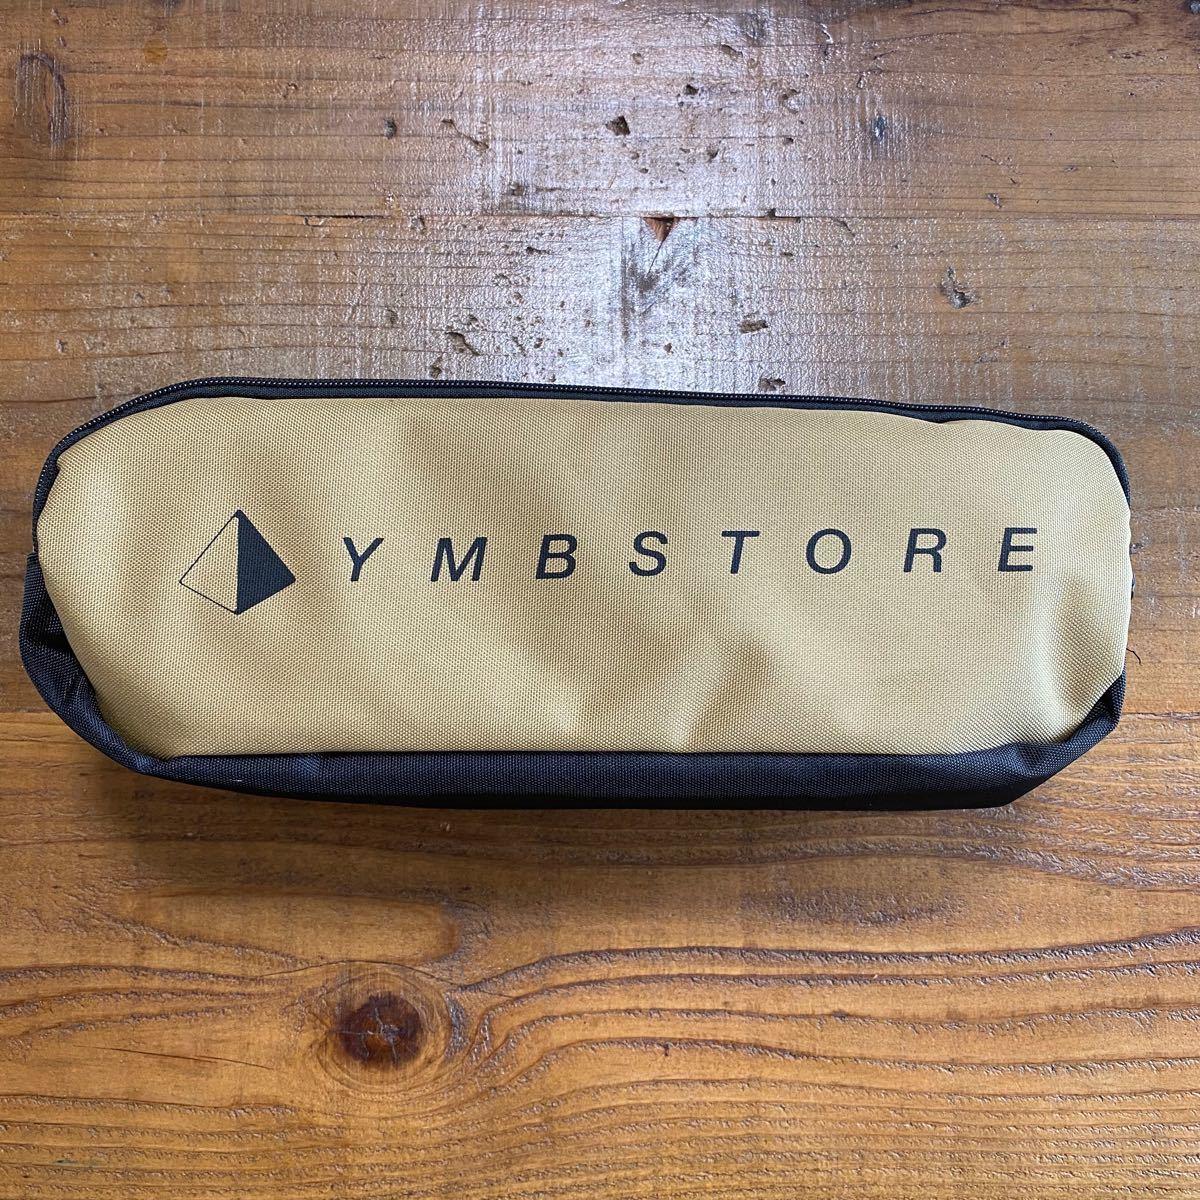 YMB STORE アウトドアチェア コンパクト イス 軽量 ヘリノックス